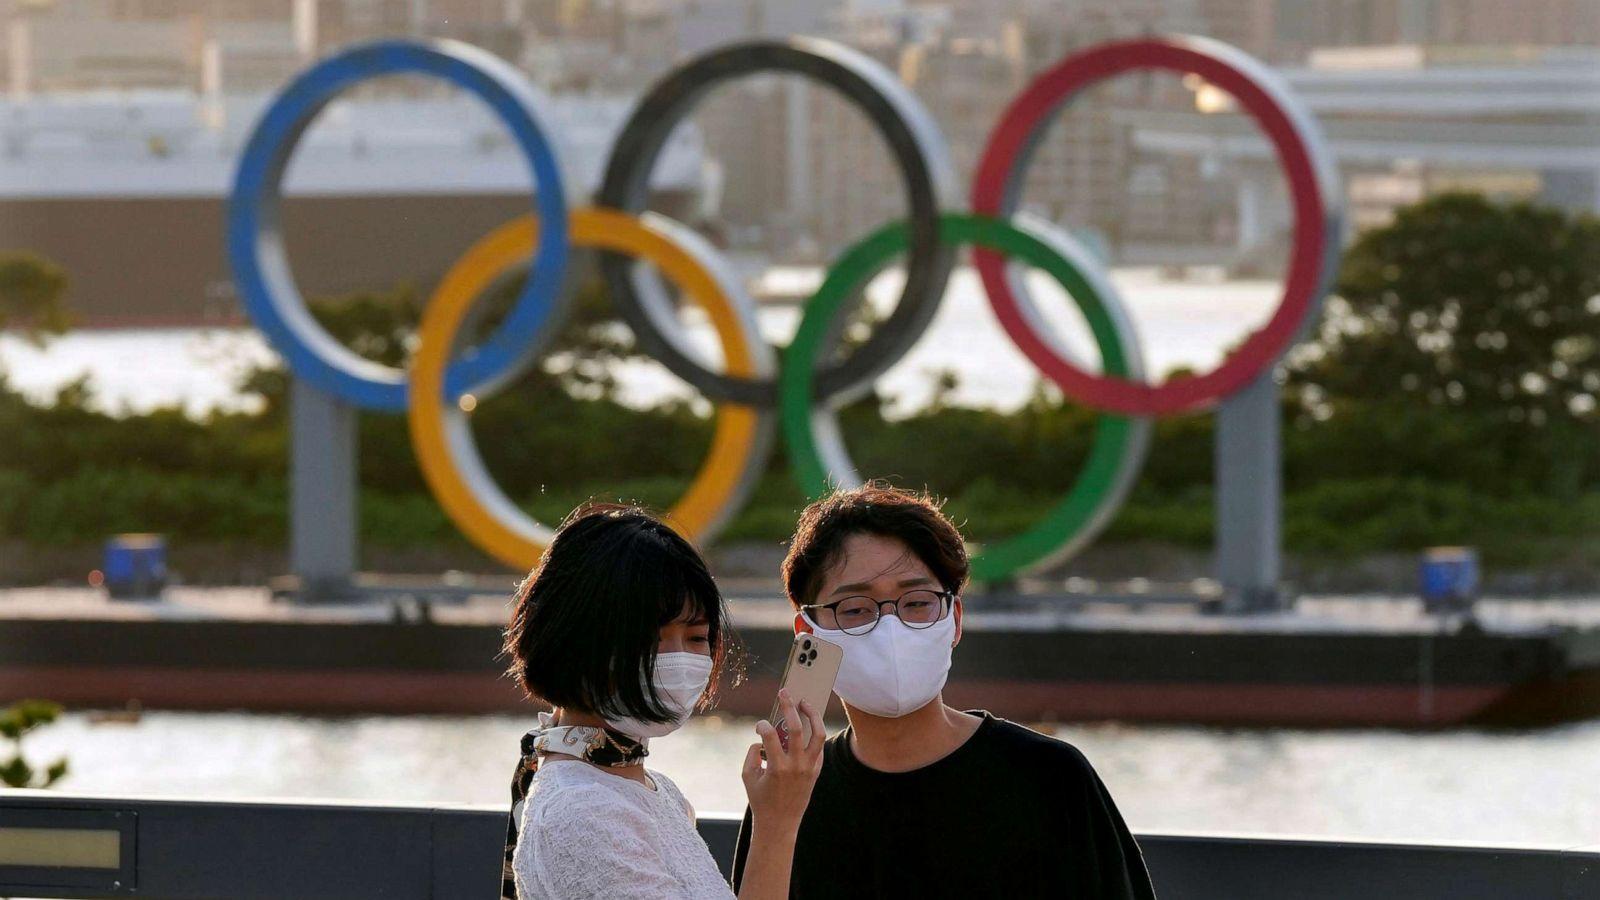 abcnews.go.com - Morgan Winsor - Tokyo Olympics opening ceremony: How to watch